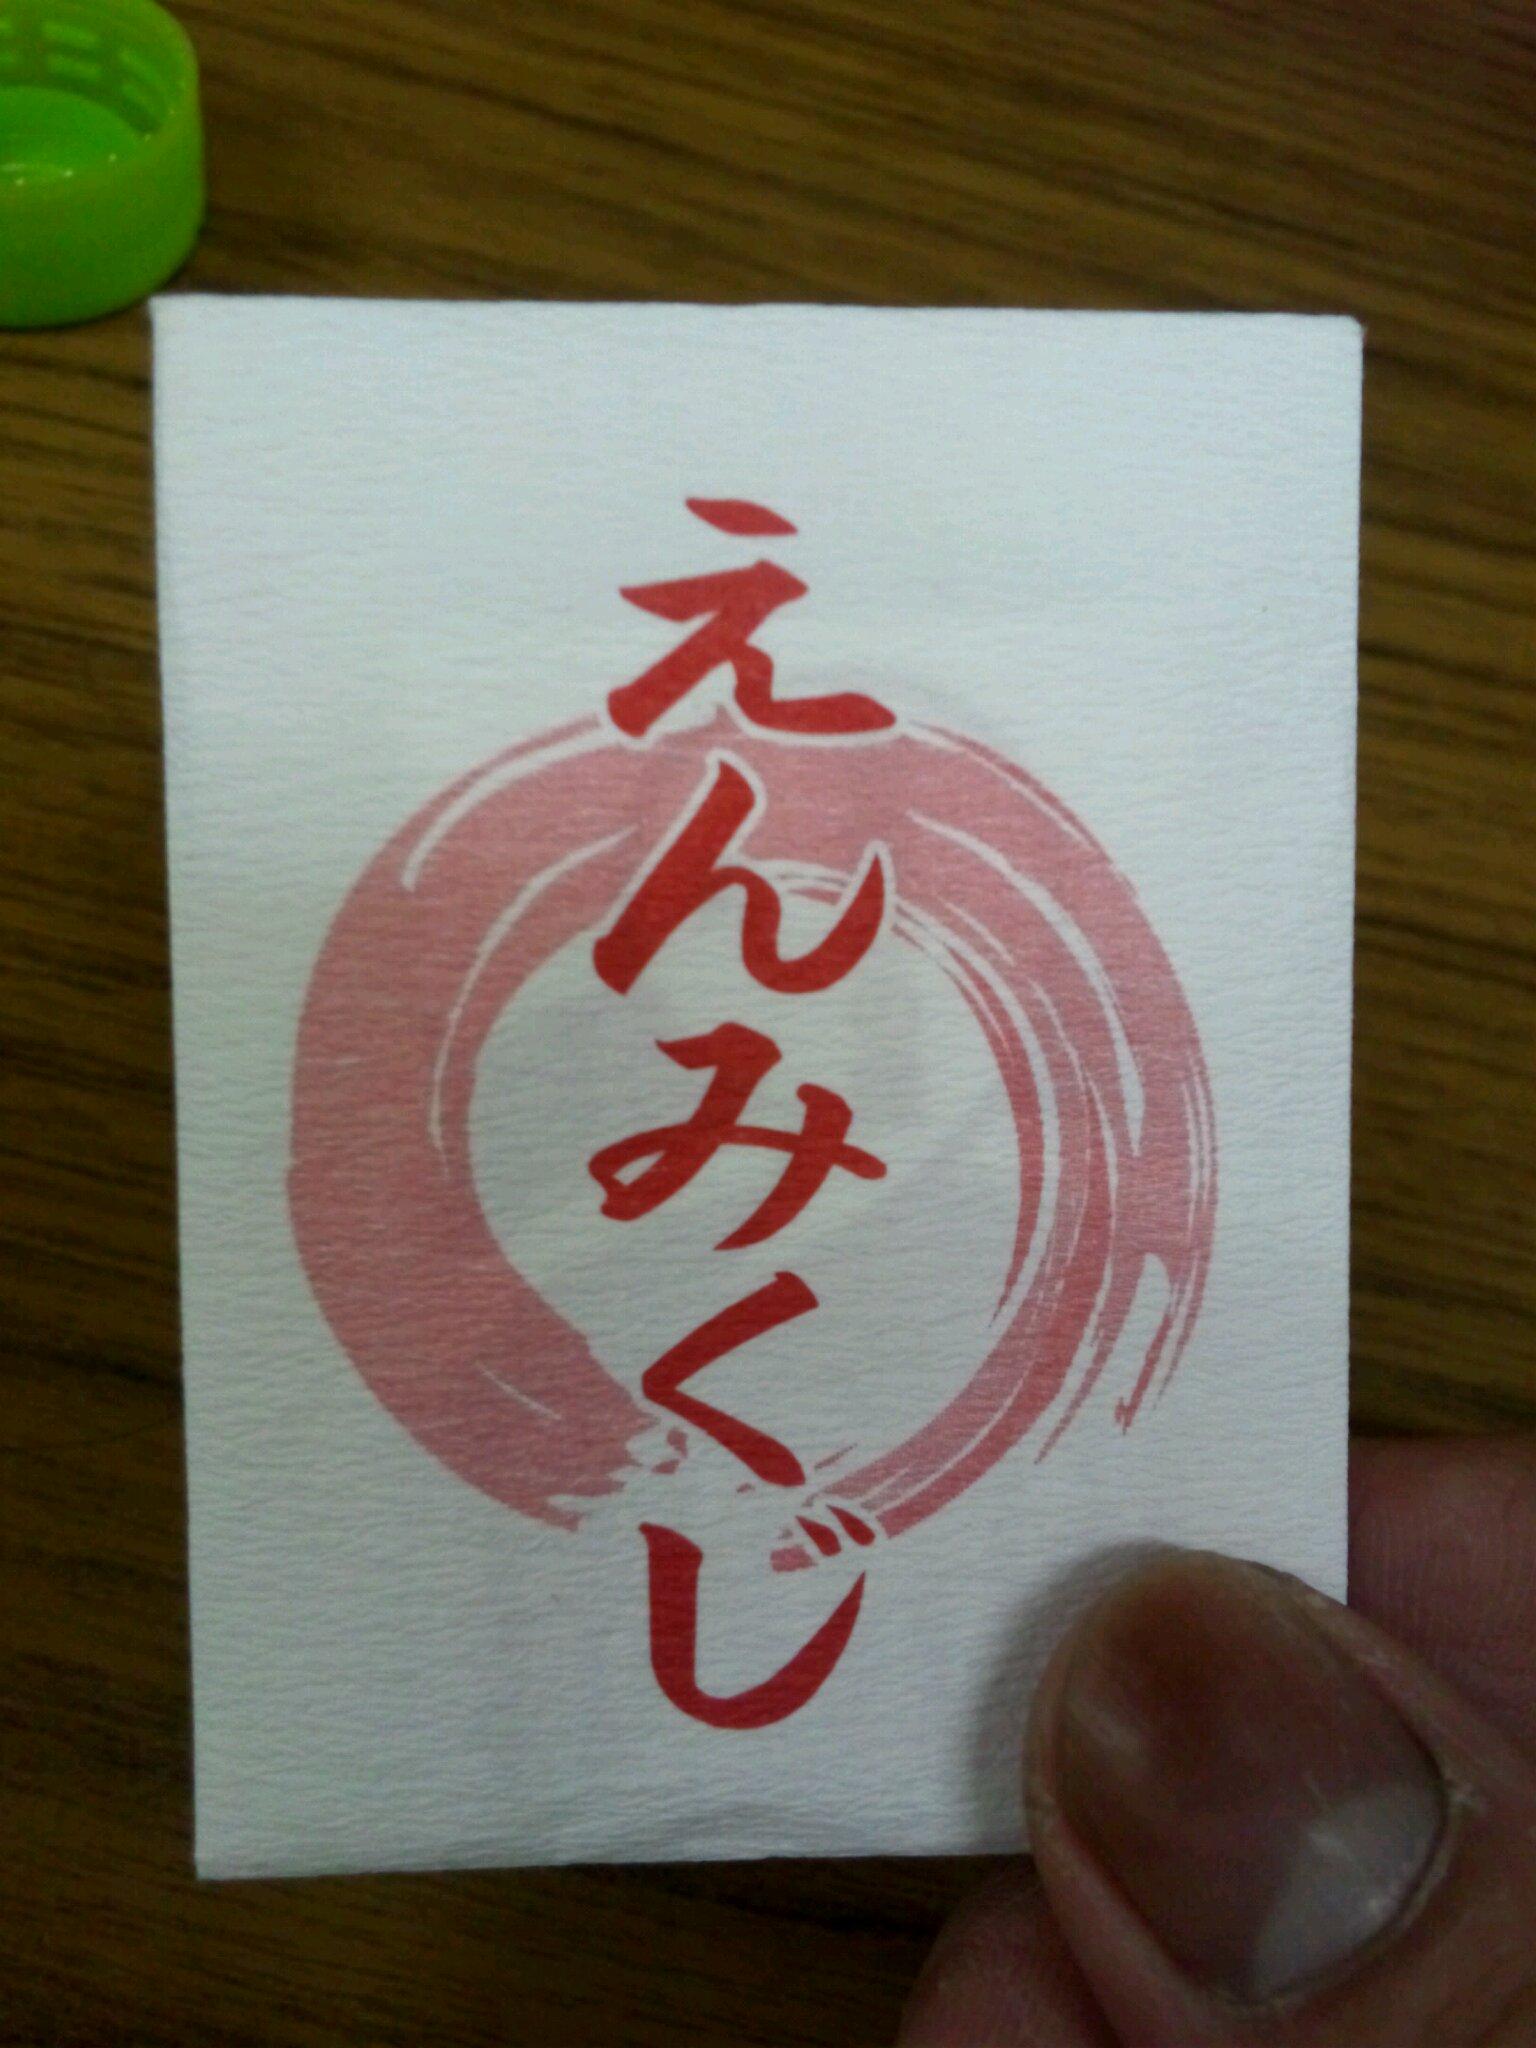 No384 prime 「初祈祷」